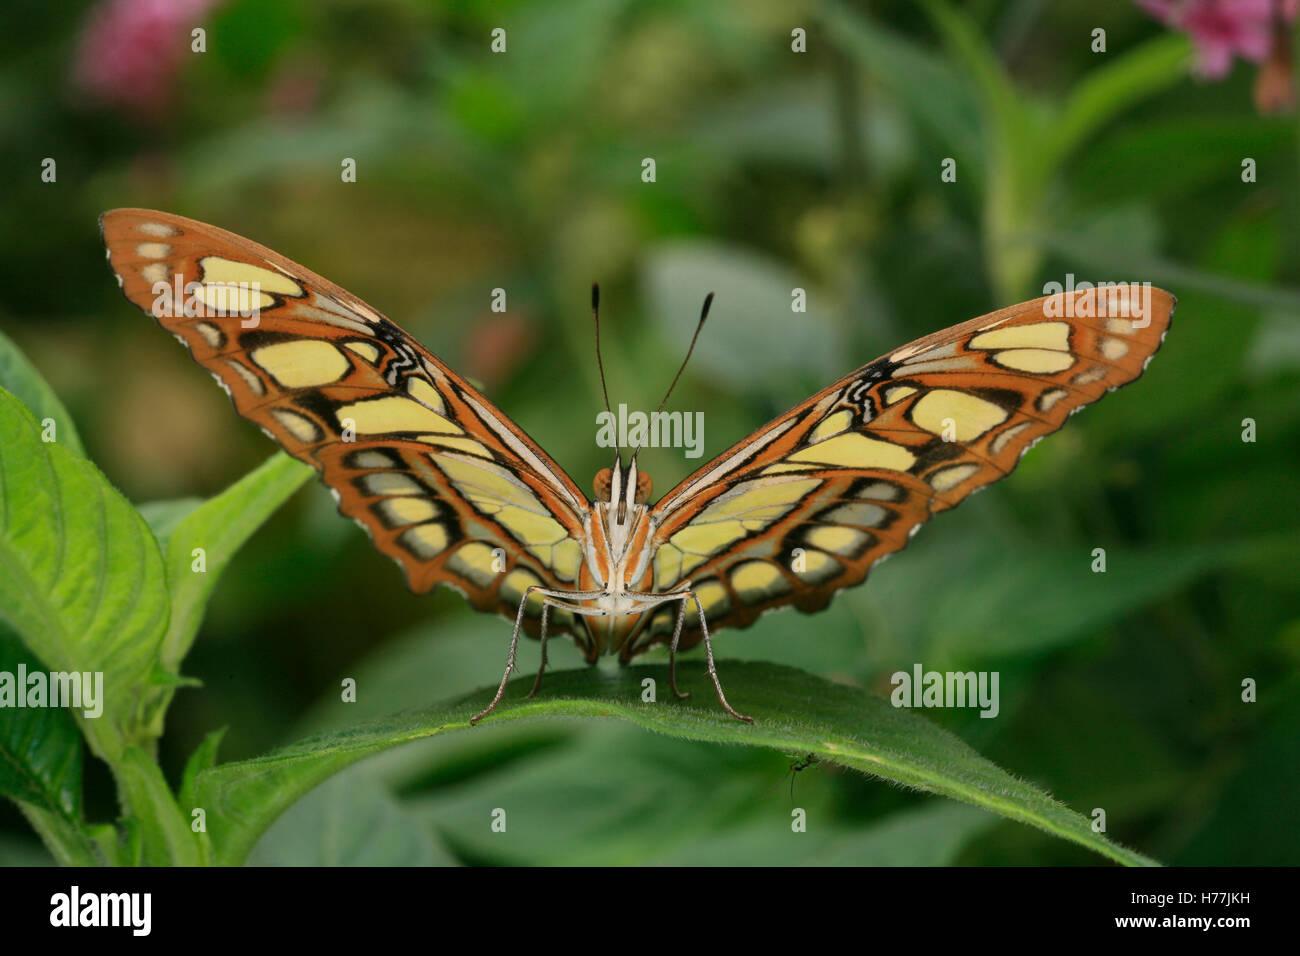 Malaquita Siproeta stelenes (mariposas), Finca de Mariposas, Monteverde, Costa Rica. Foto de stock